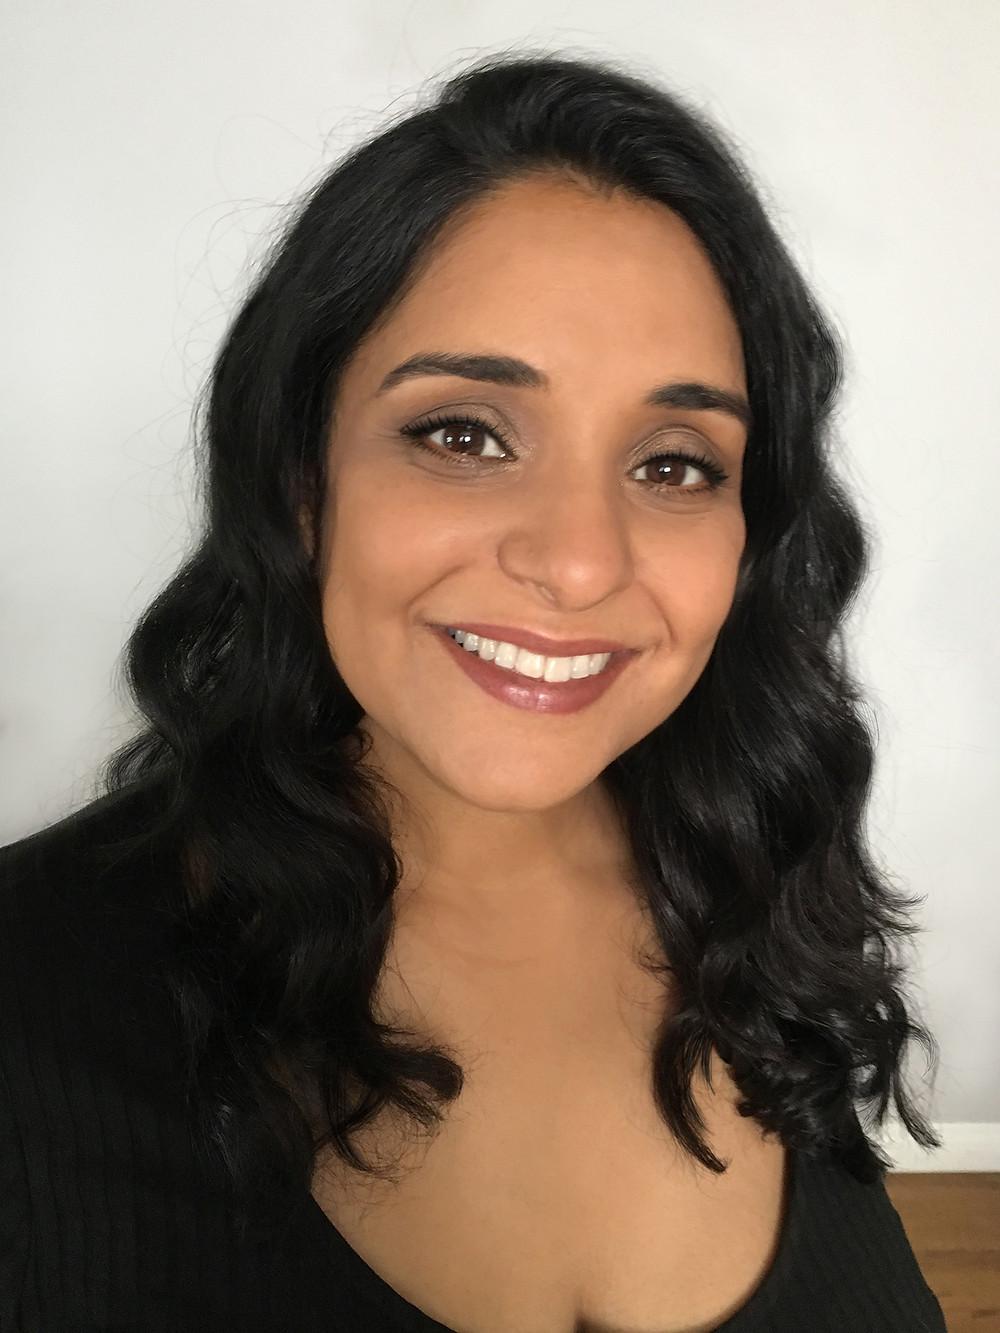 Neelanjana Banerjee is looking at the camera and smiling.